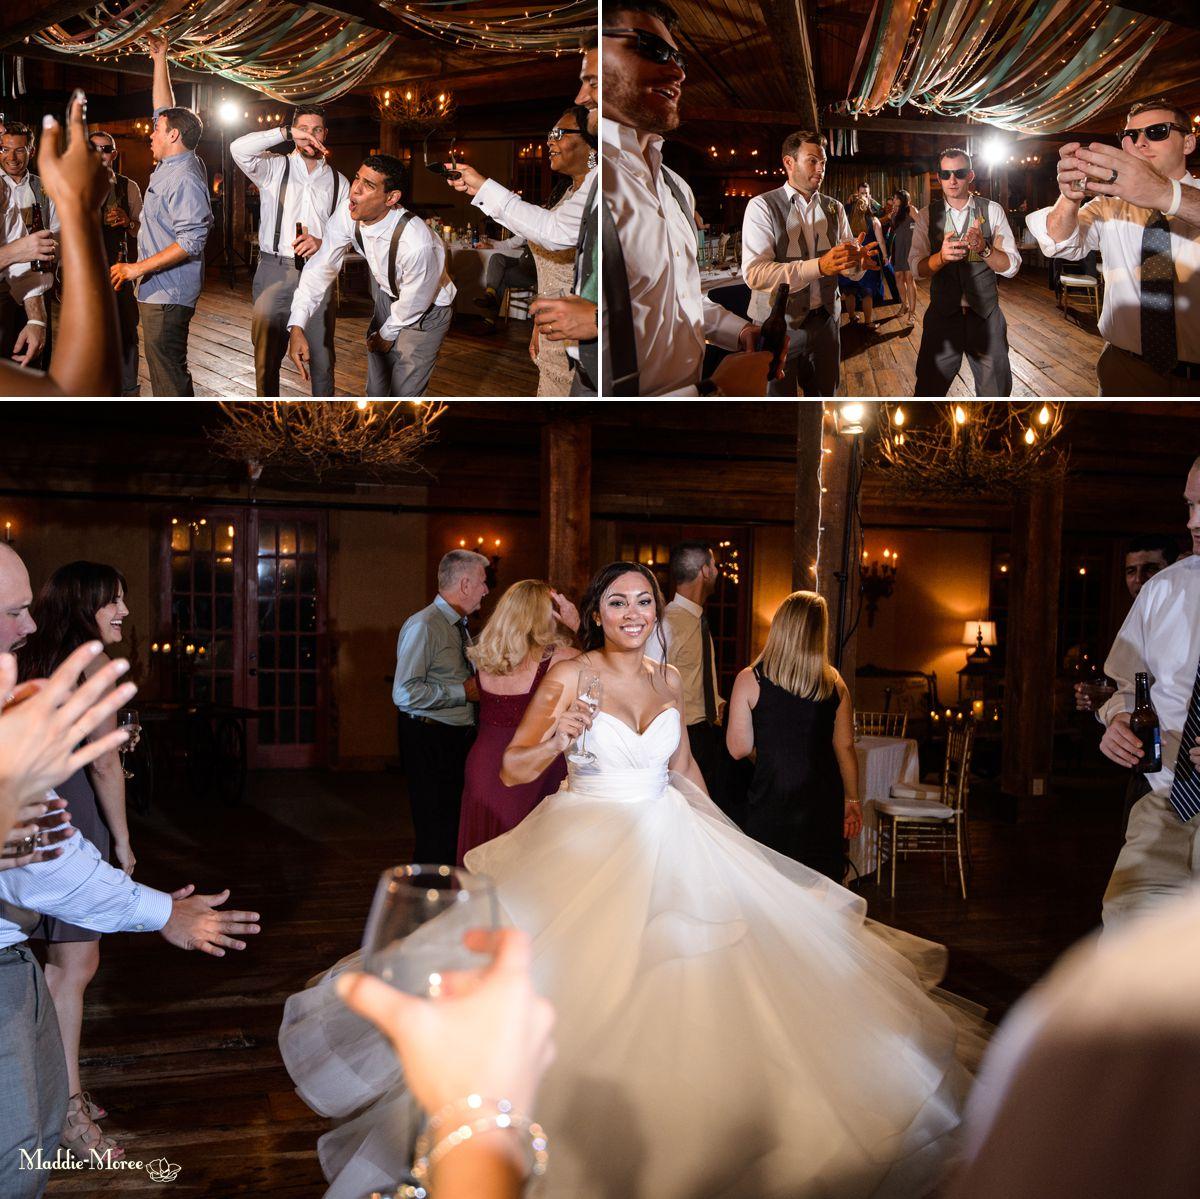 heartwood hall wedding reception